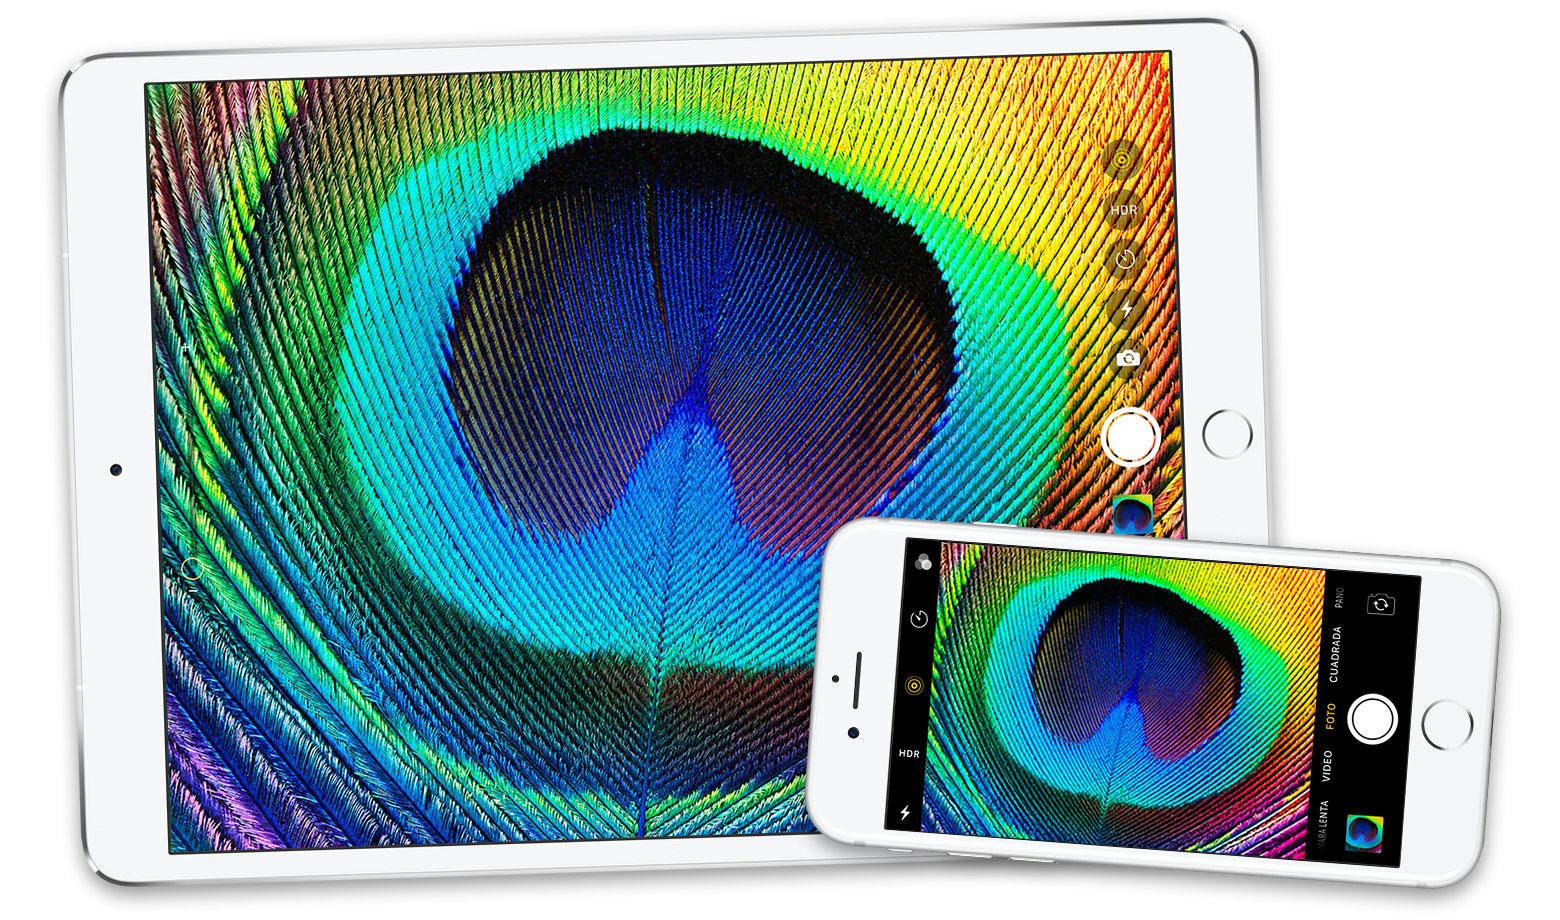 Tomar y editar fotos con tu iPhone, iPad o iPod touch - Soporte ...